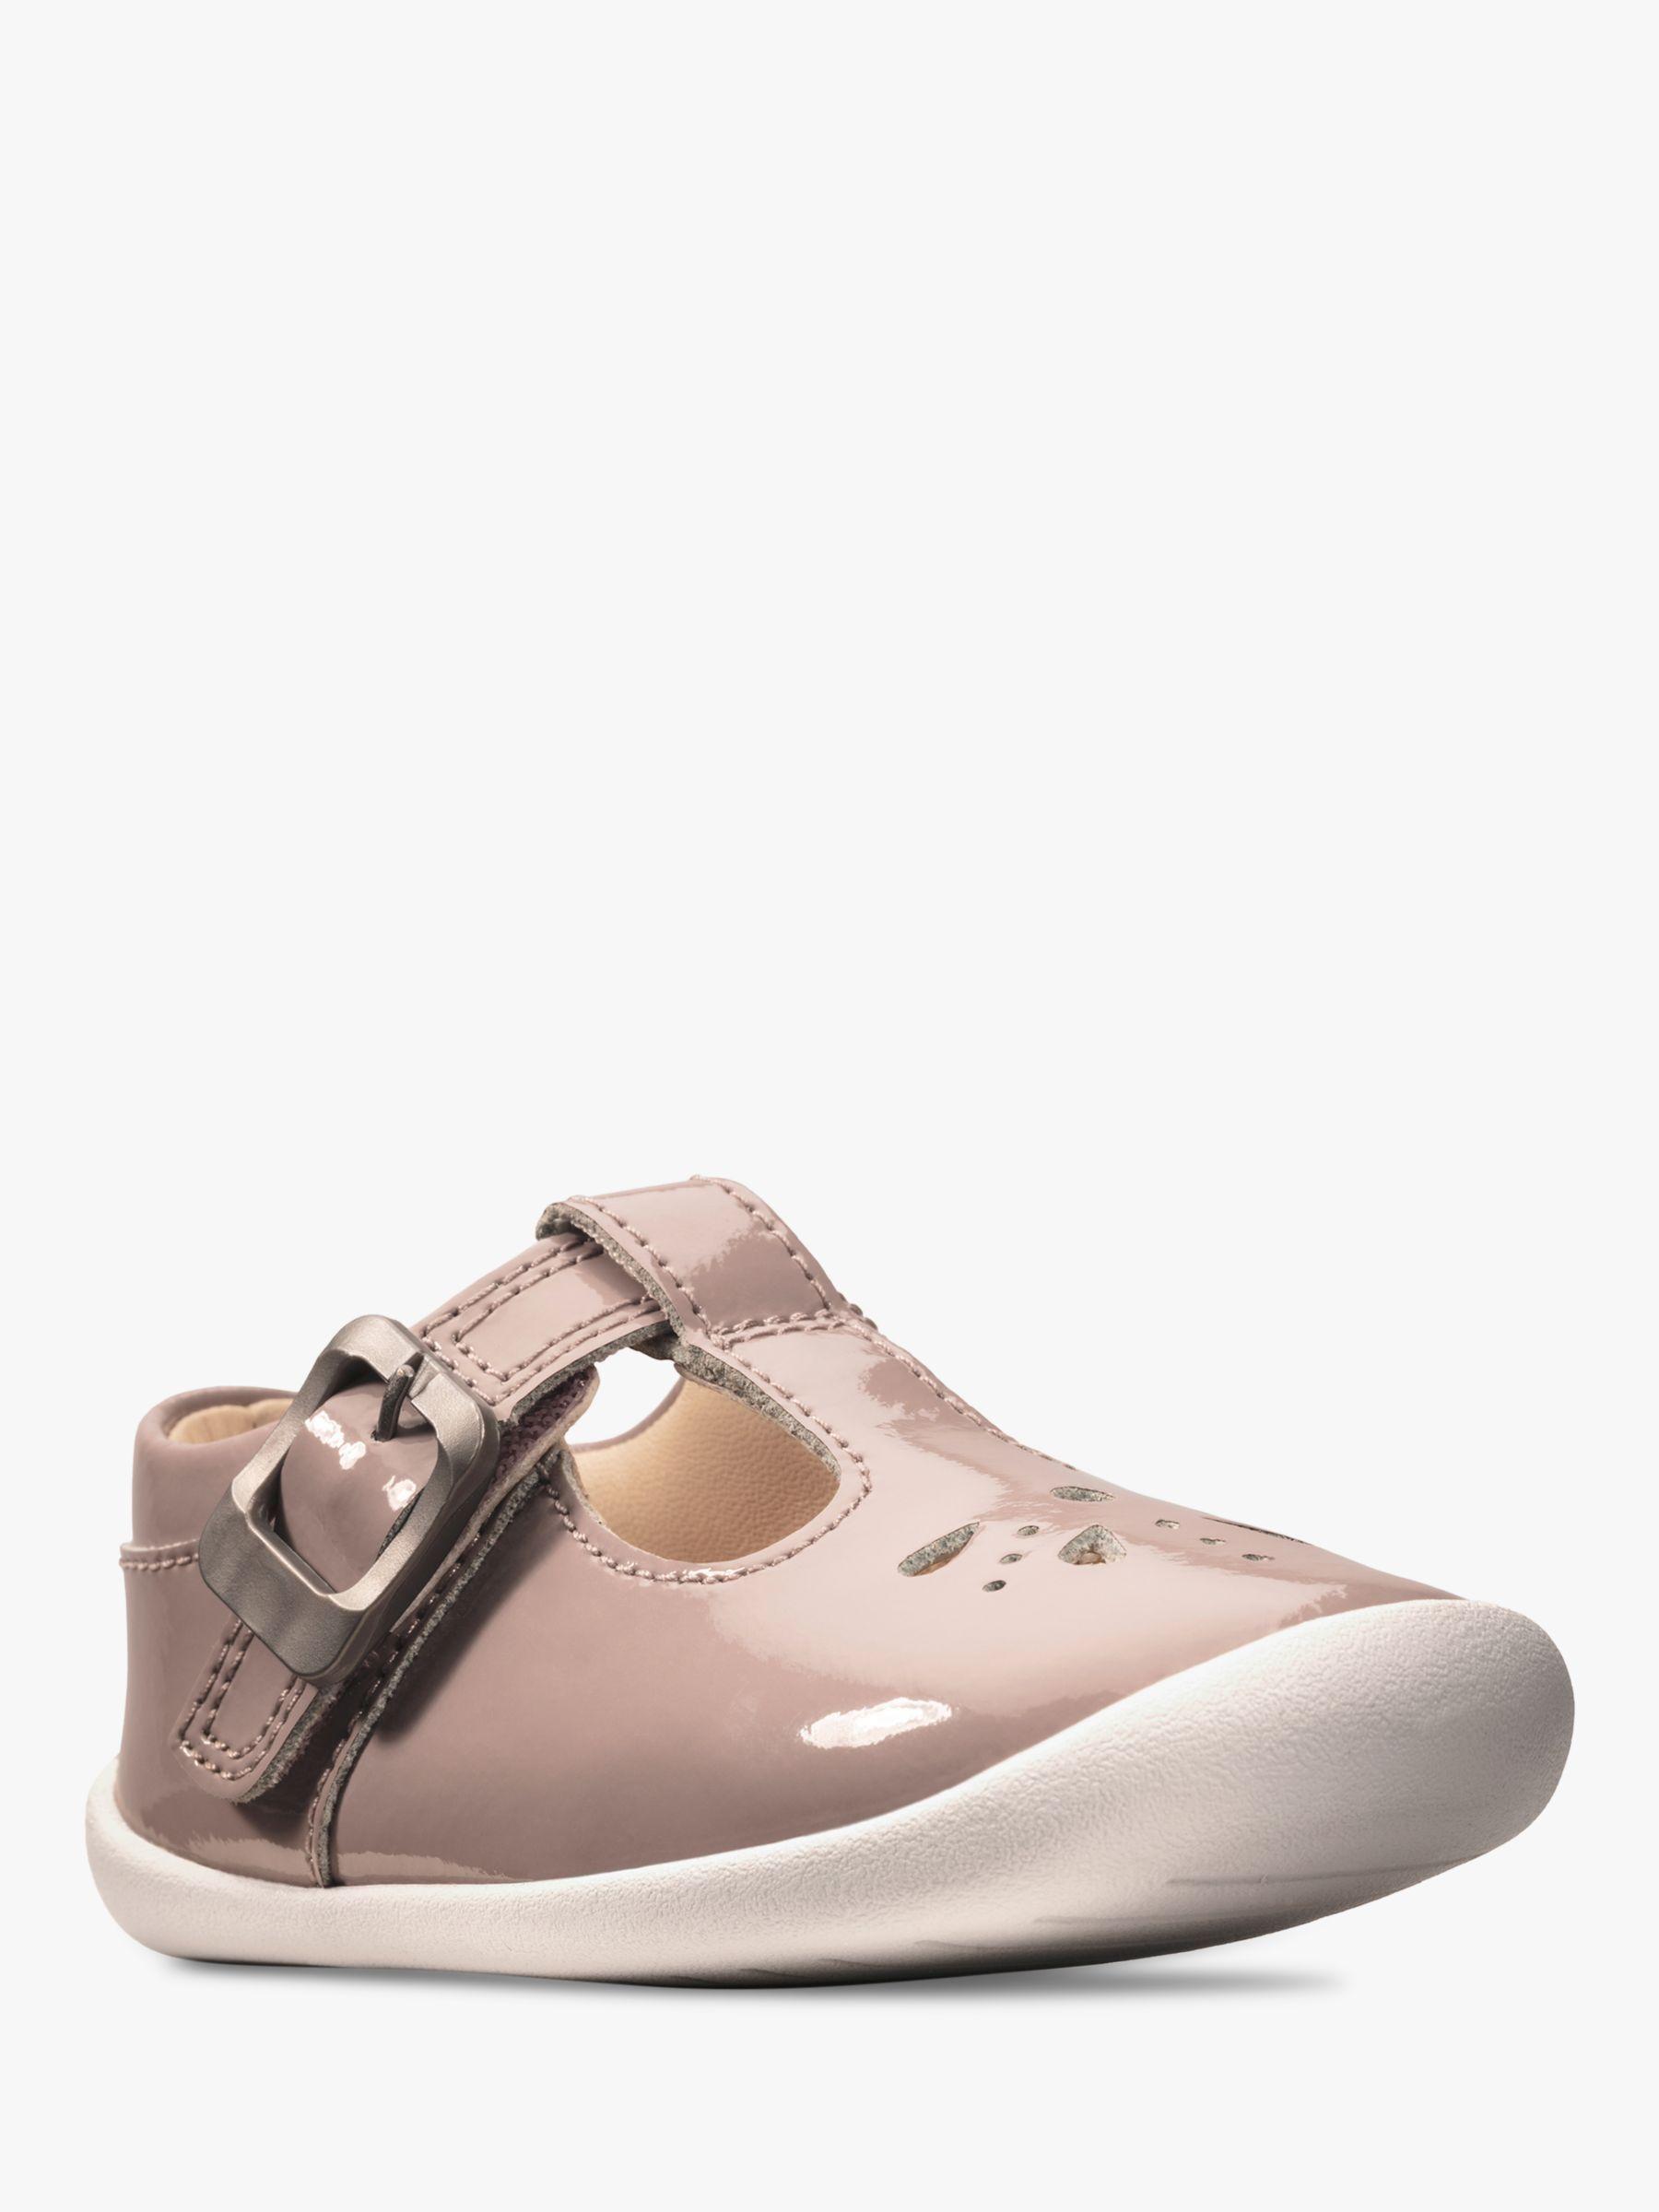 Walker shoes, Clarks